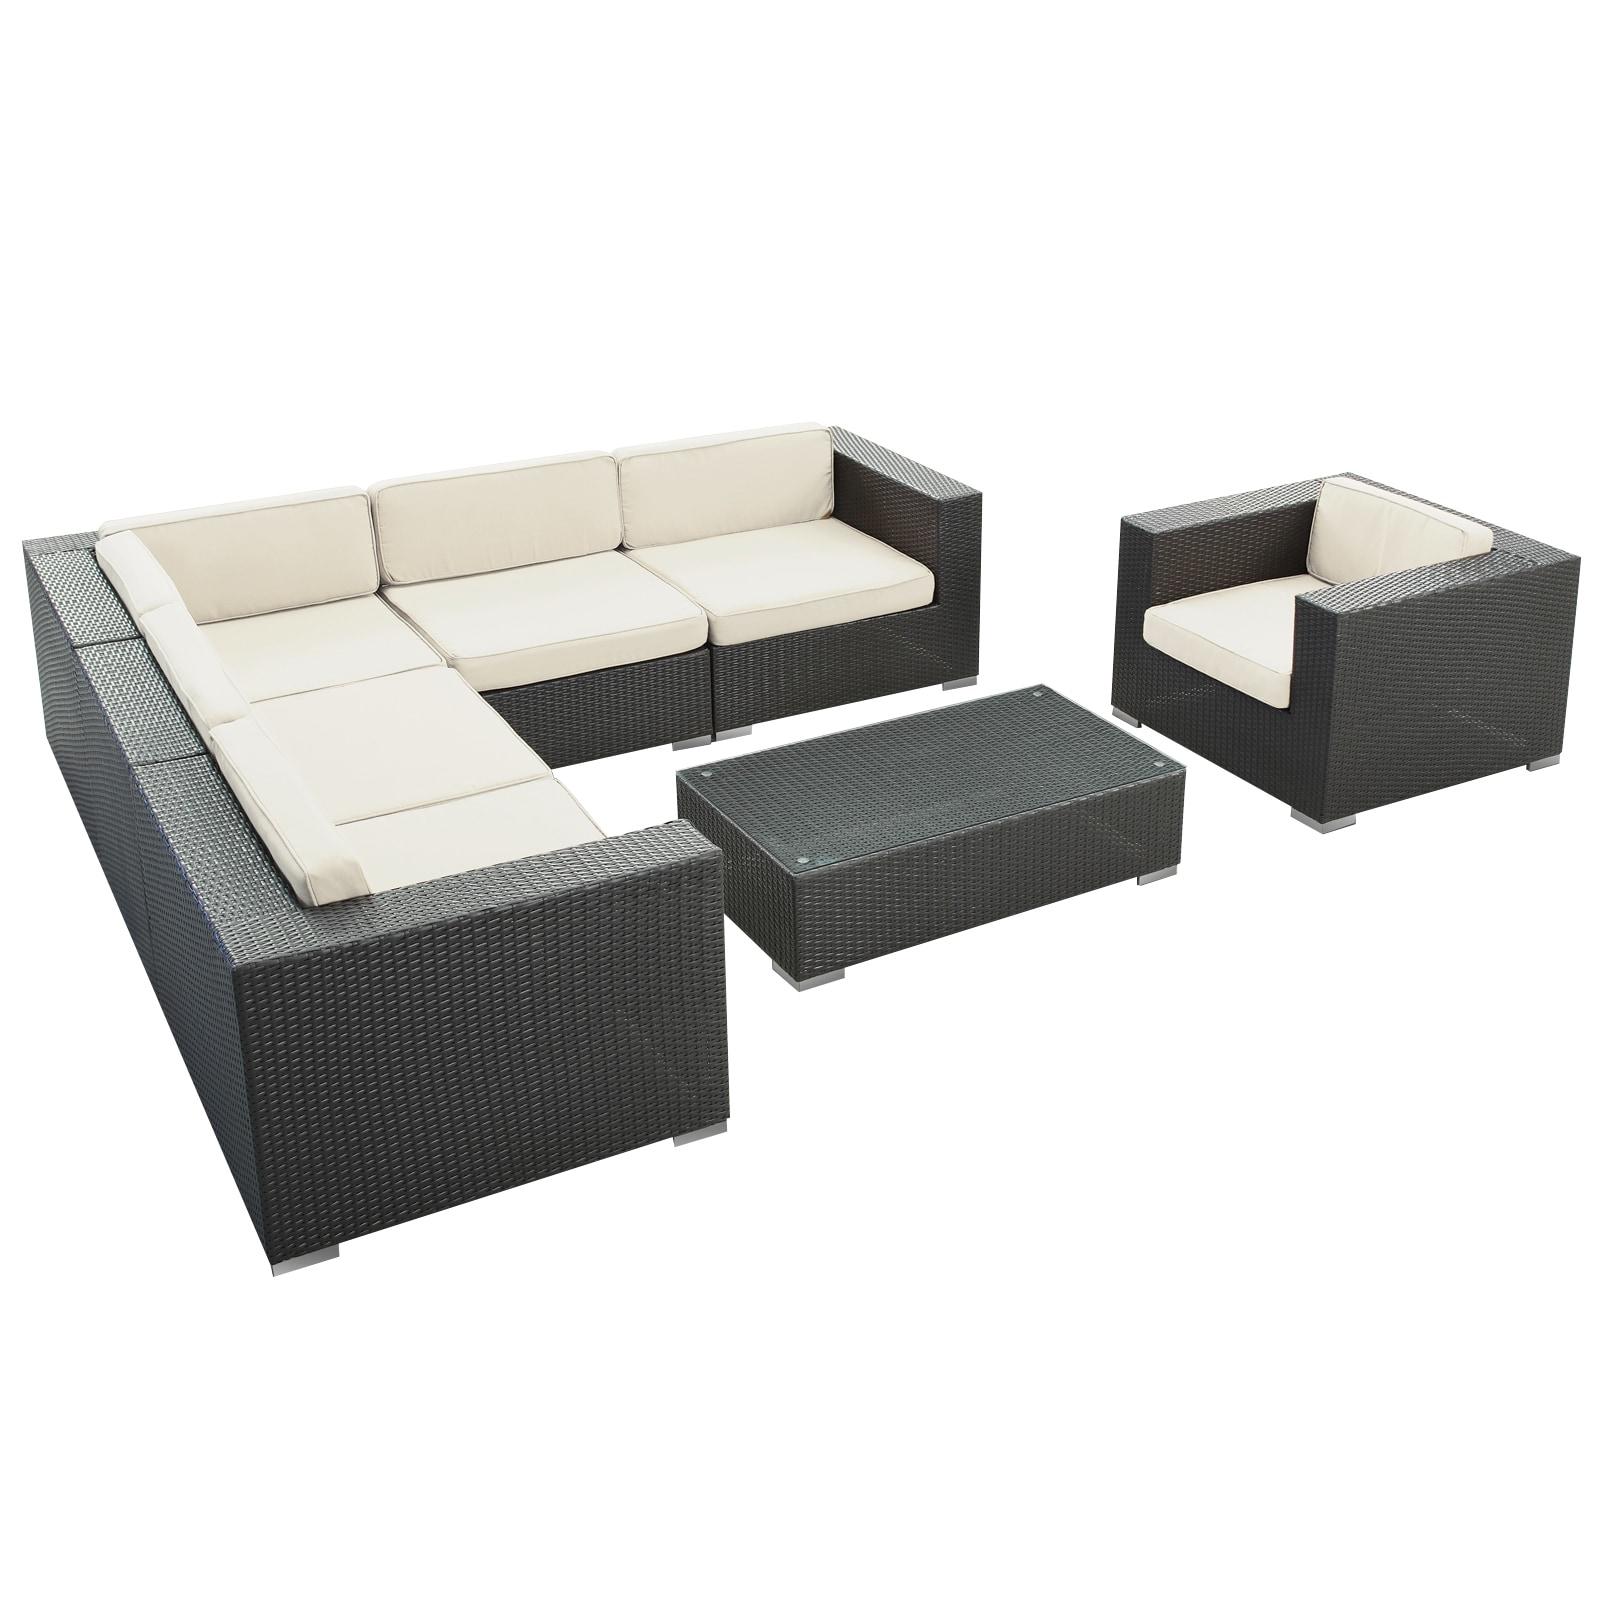 Corona Outdoor Patio Espresso 7 Piece Sectional Sofa Set Free